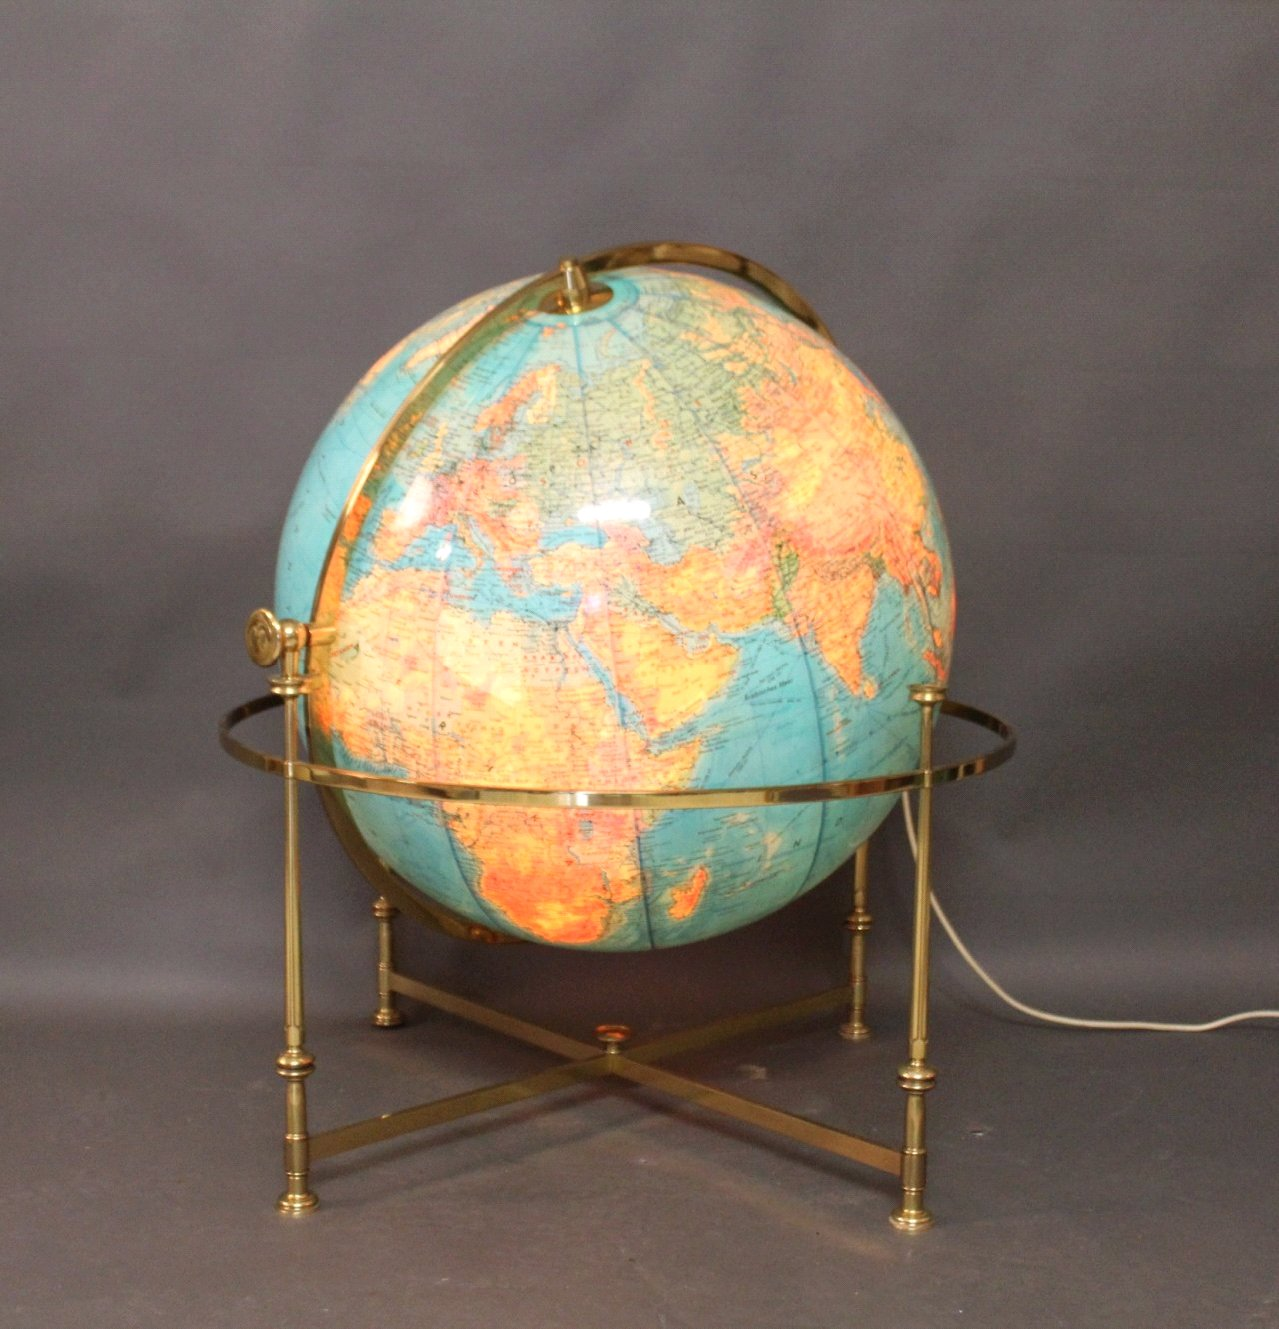 Vintage Globus aus Acryl von JRO, 1976-2